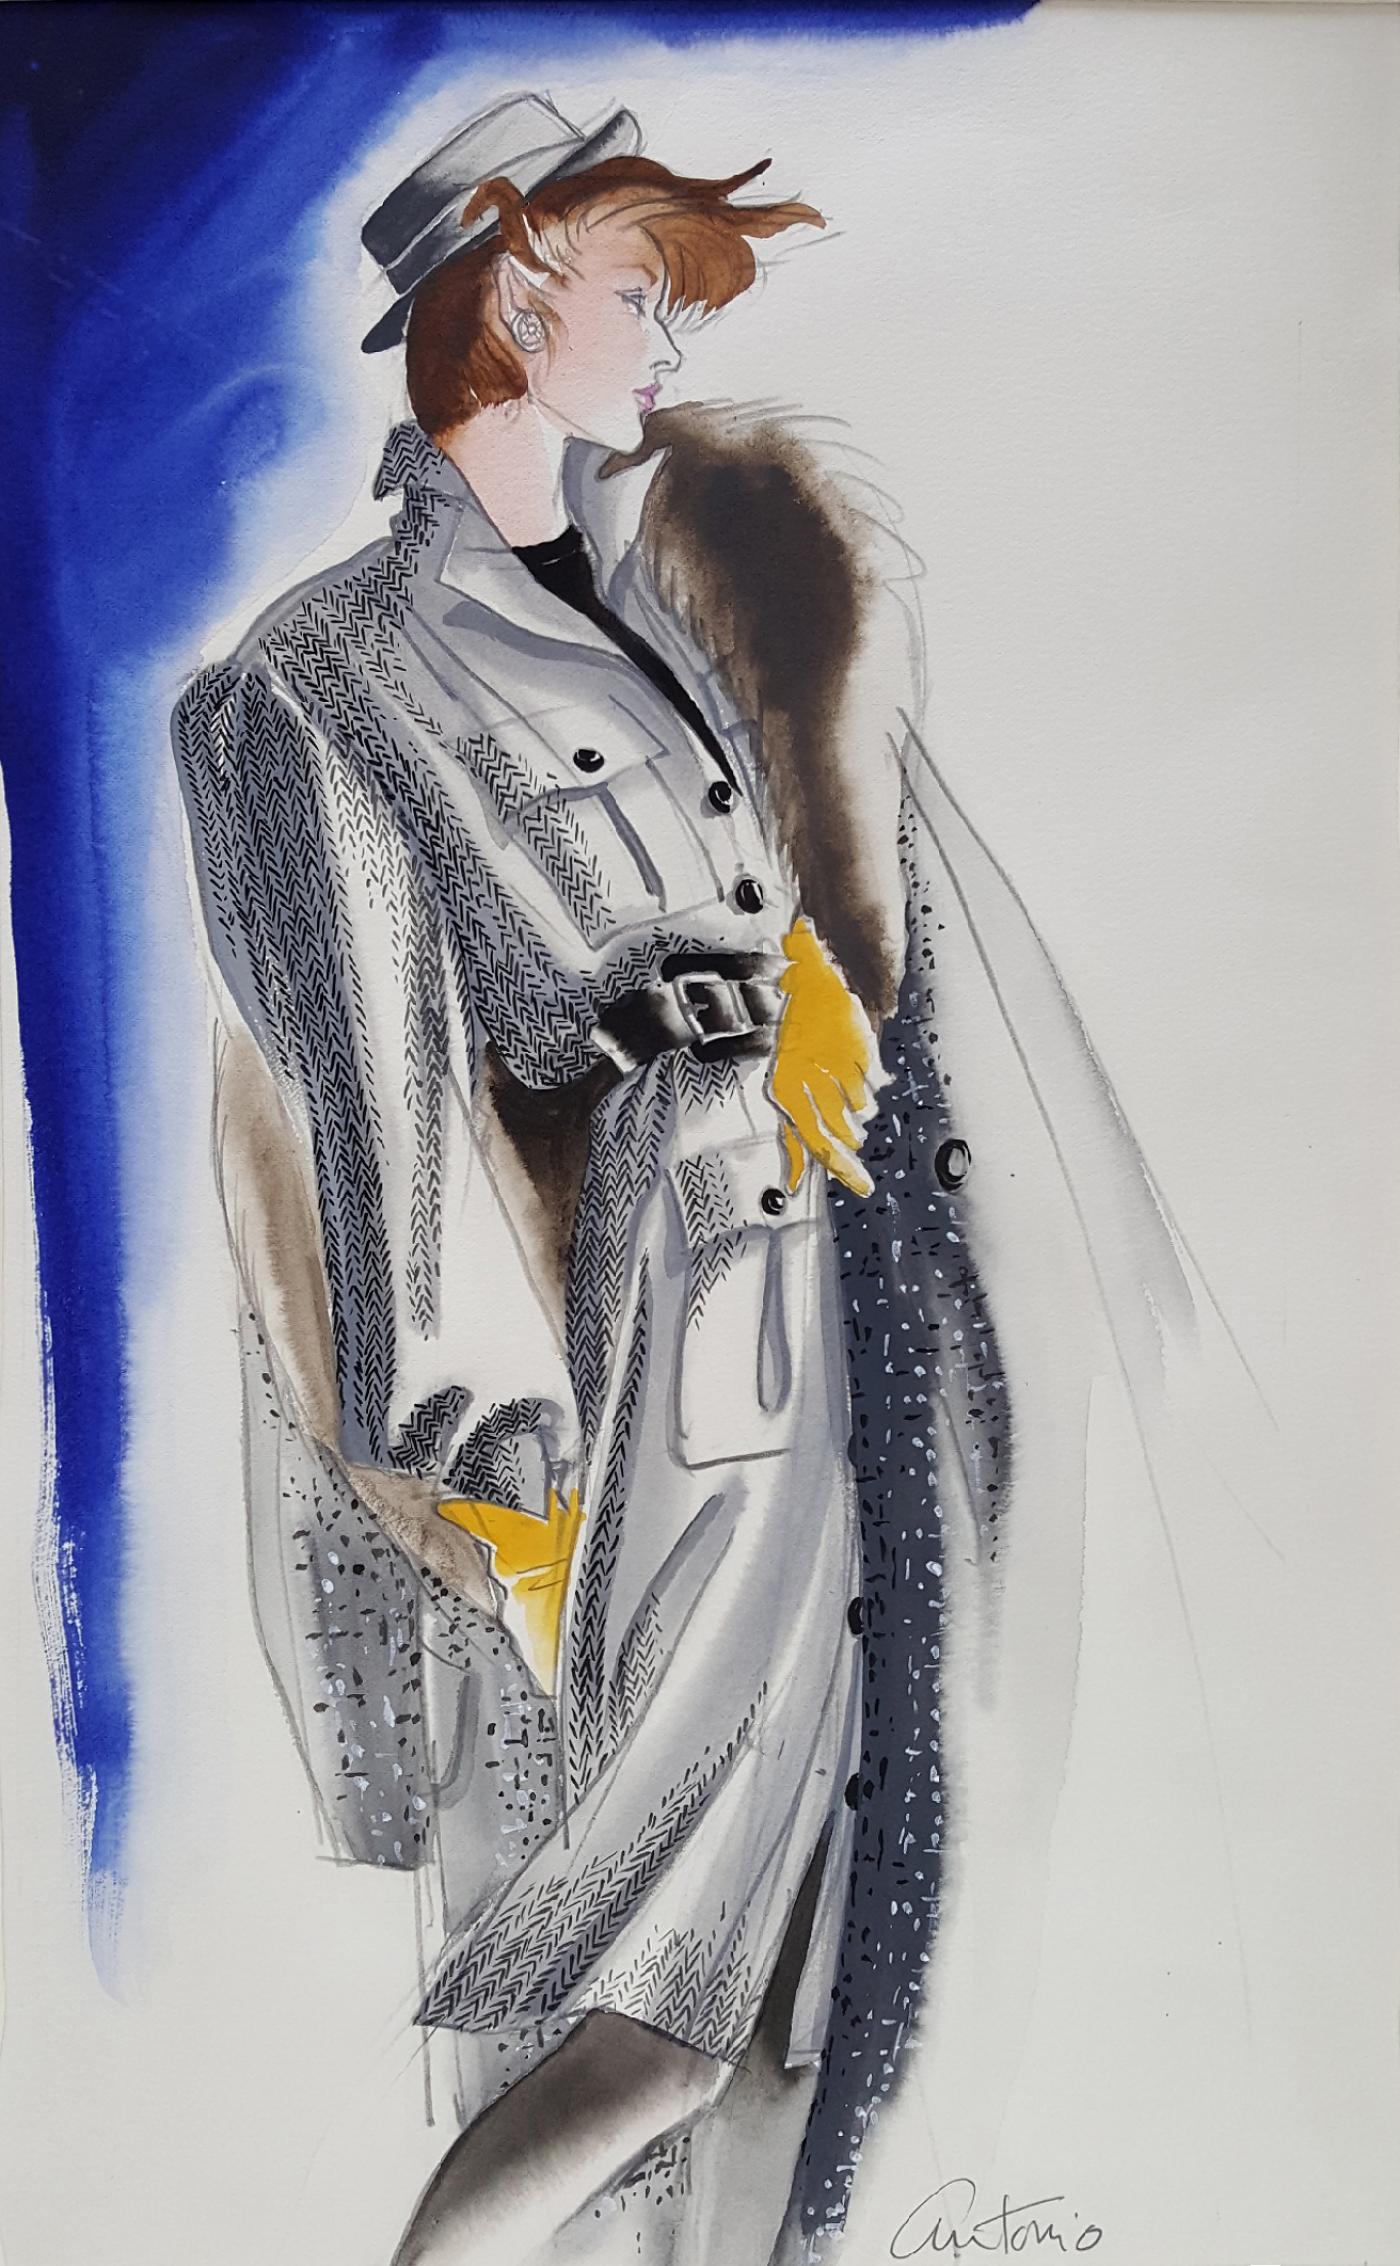 Antonio Lopez Vogue Magazine Fashion Illustration Adel Simpson 1984